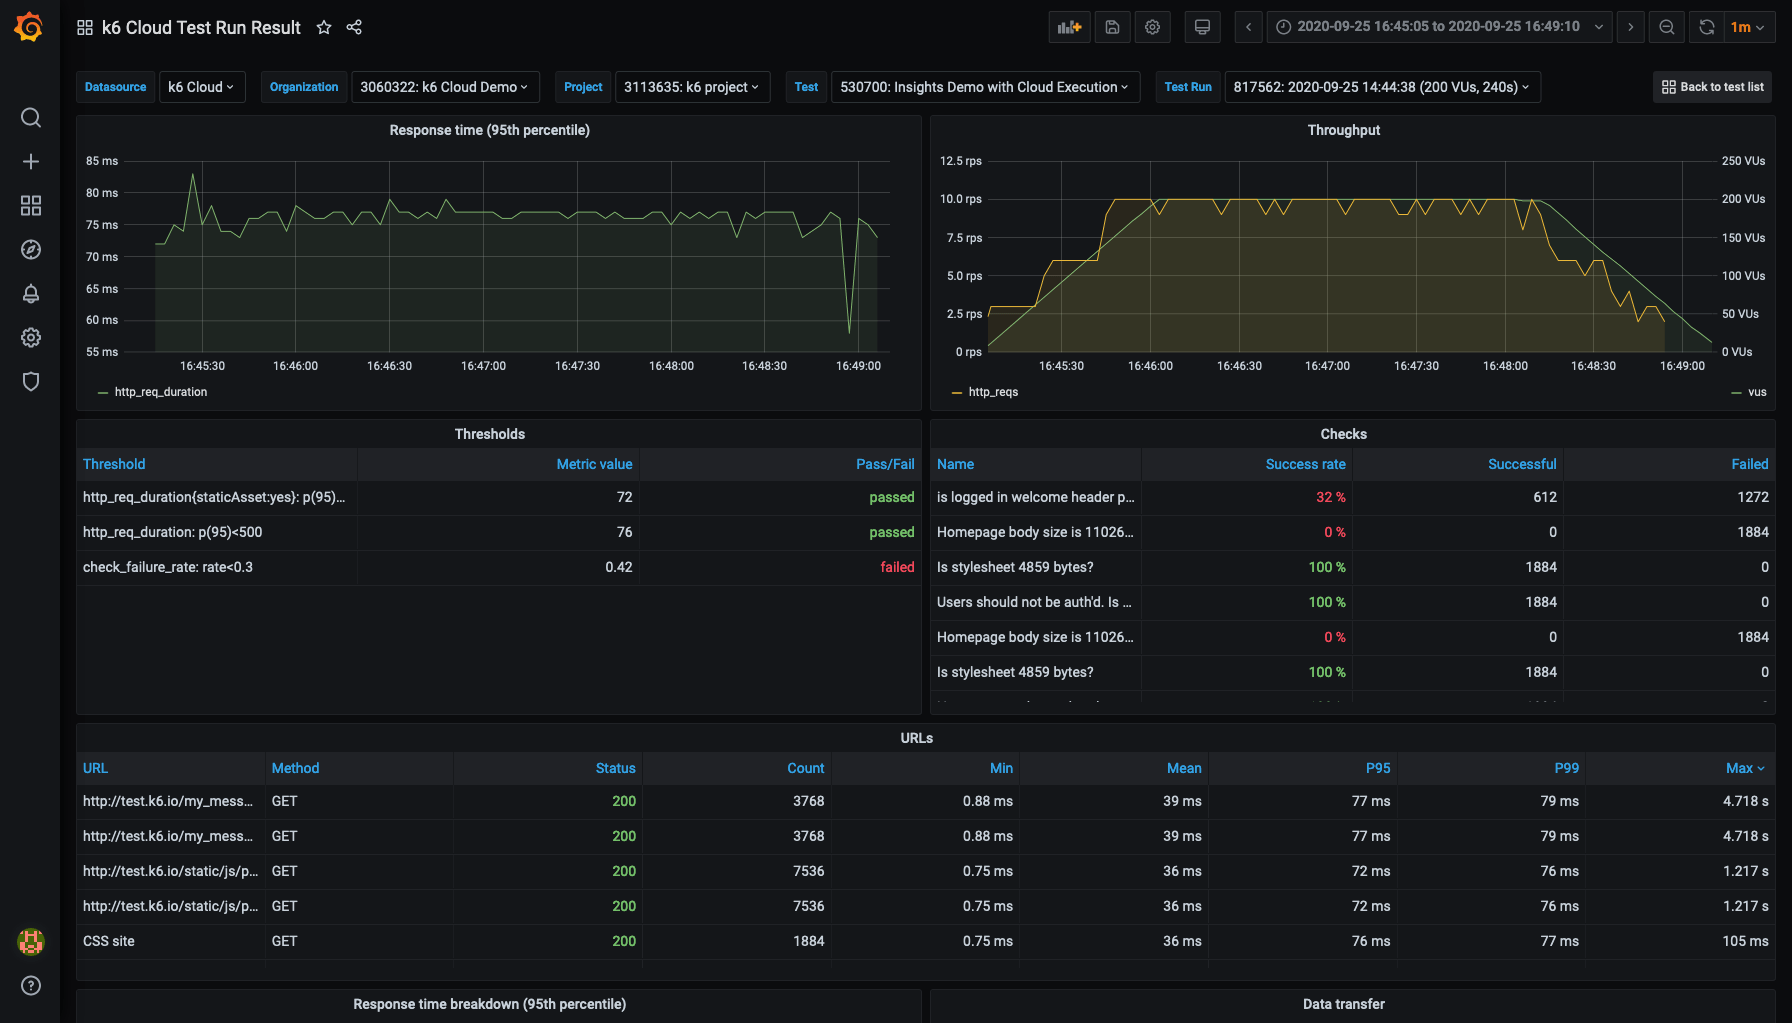 k6 Cloud Test Run Result Dashboard